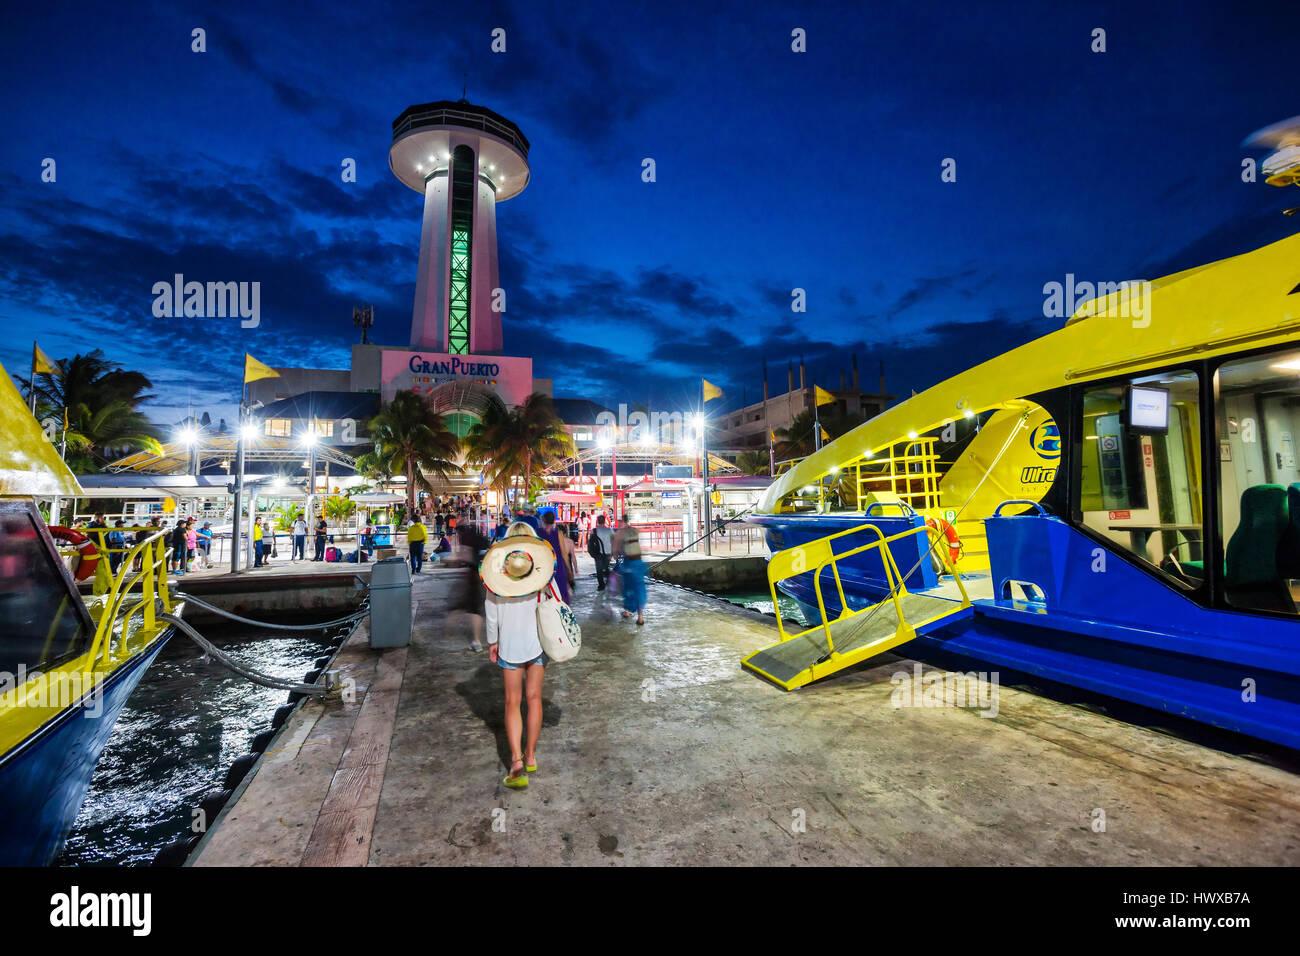 Cancun Puerto Juarez at night in Mexico.Tourists disembark. - Stock Image